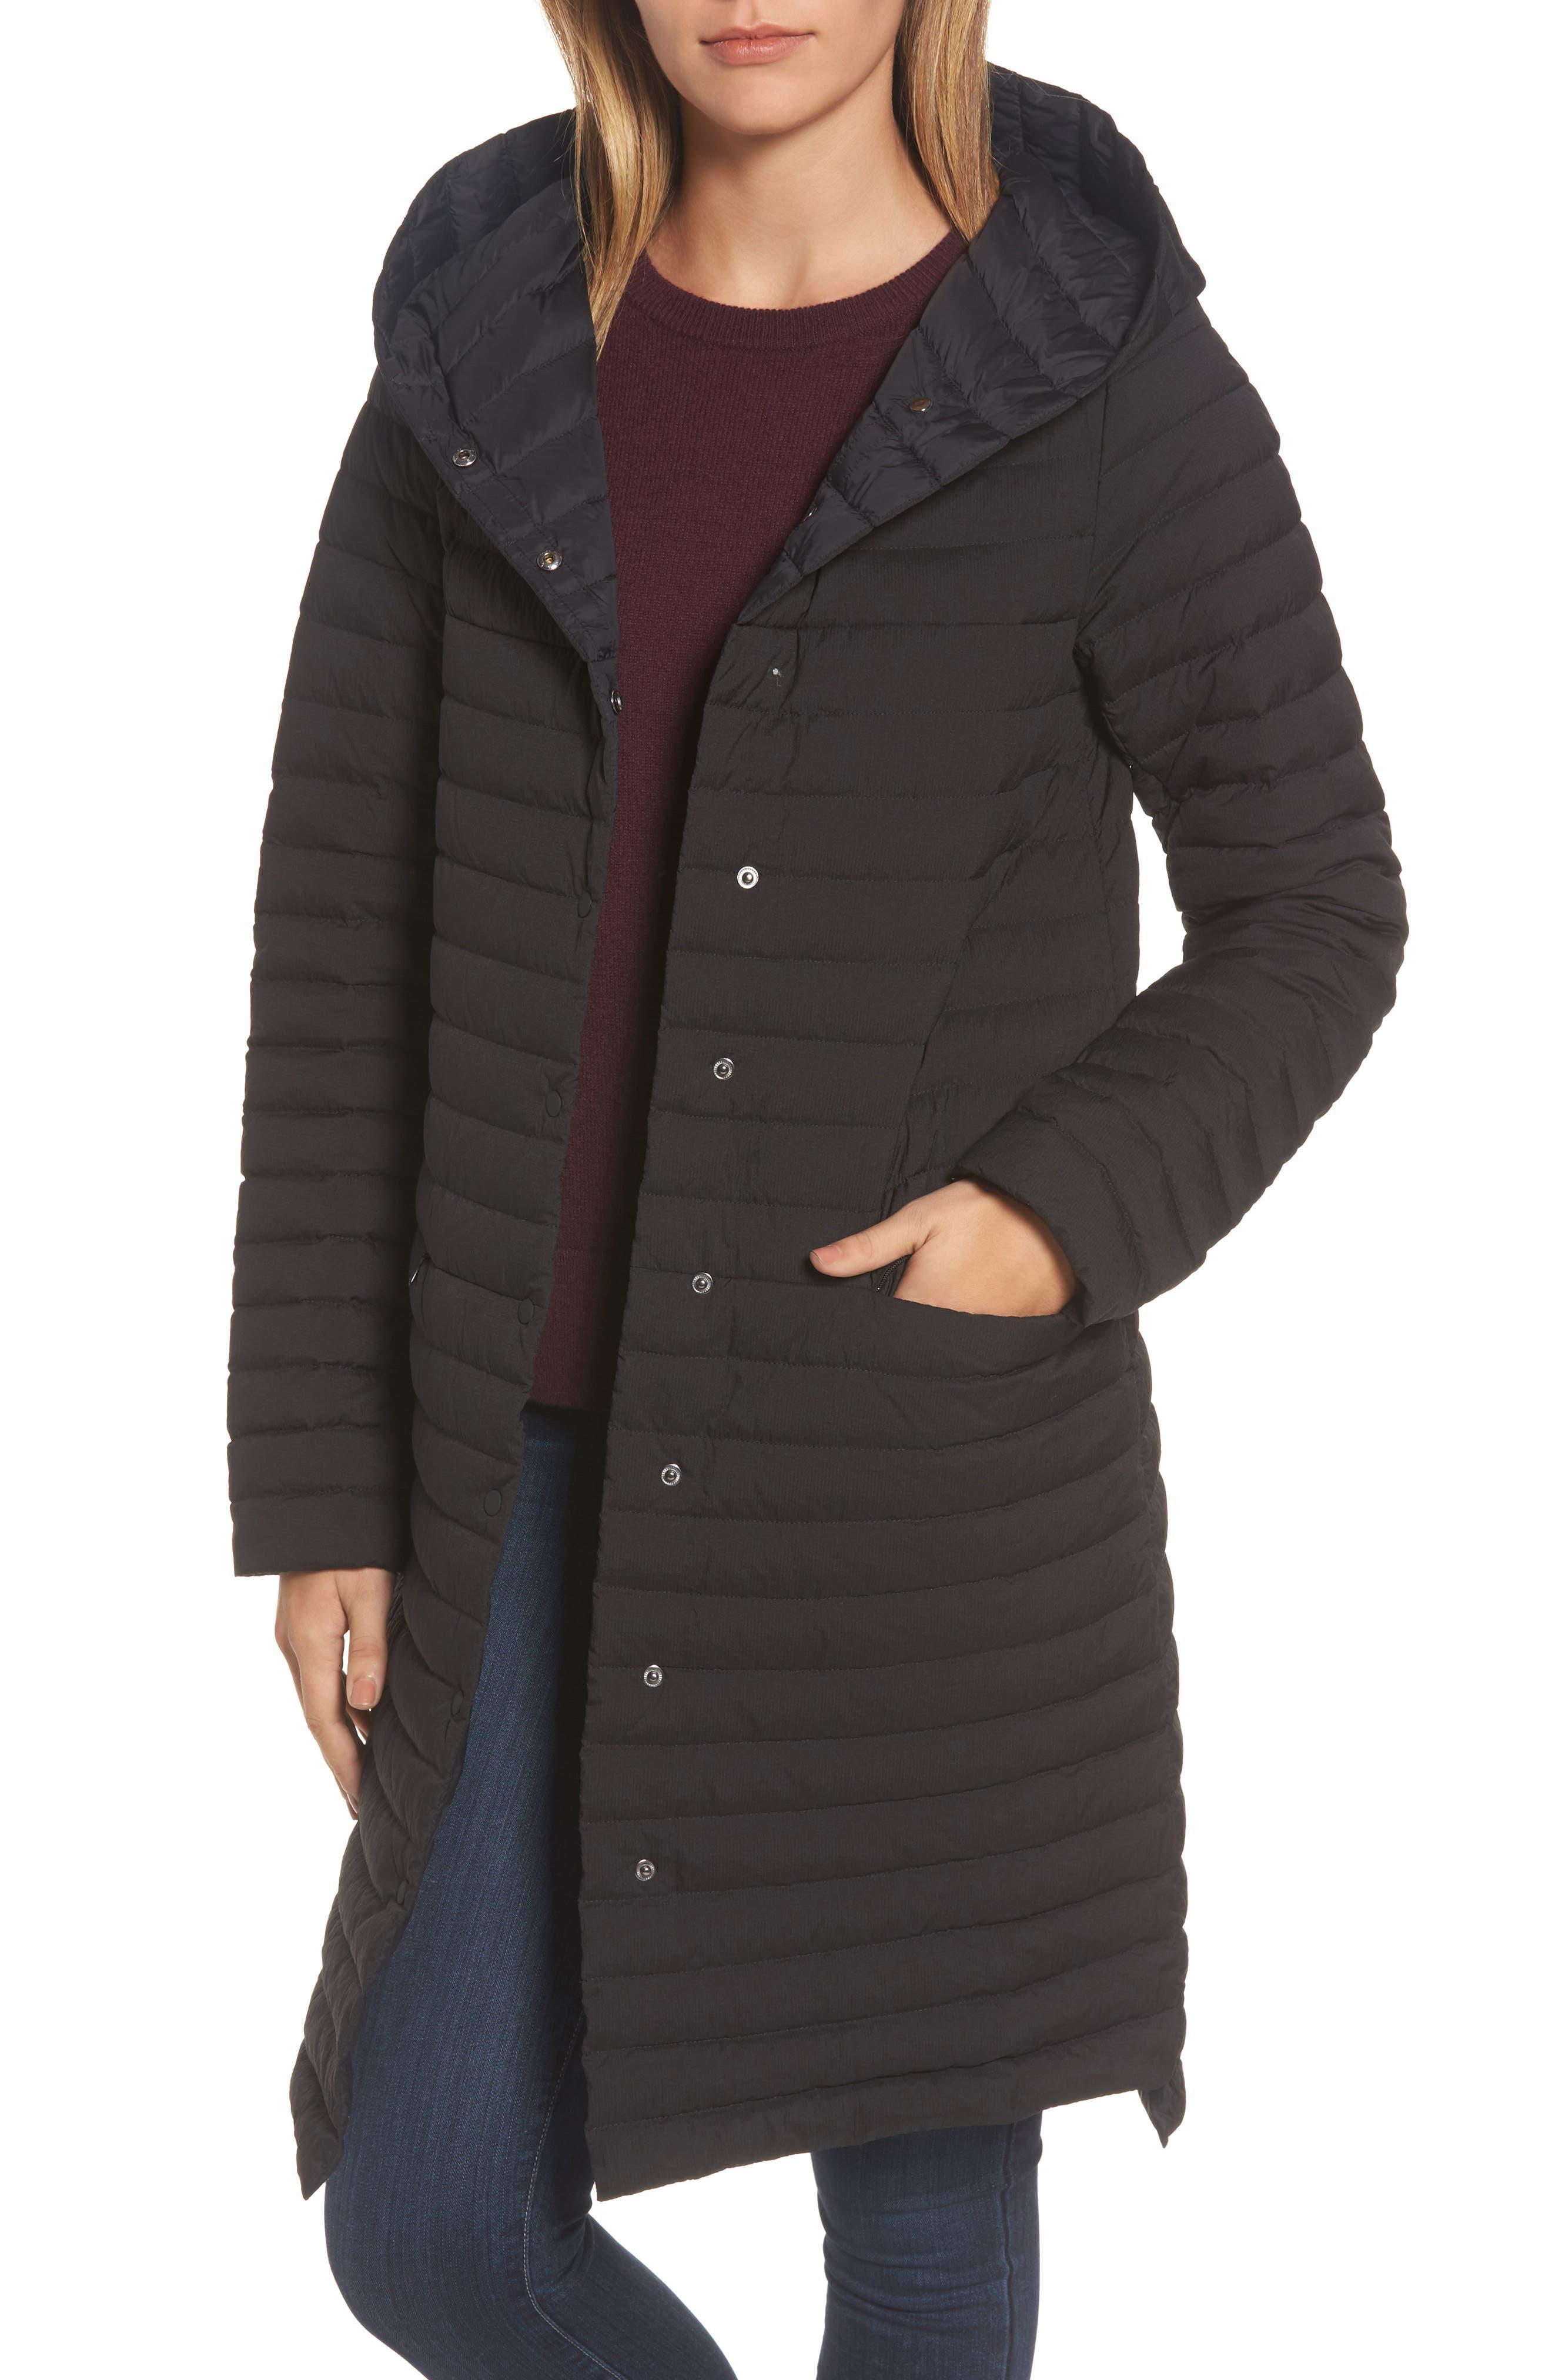 Edith Hooded Long Coat,                             Main thumbnail 1, color,                             001